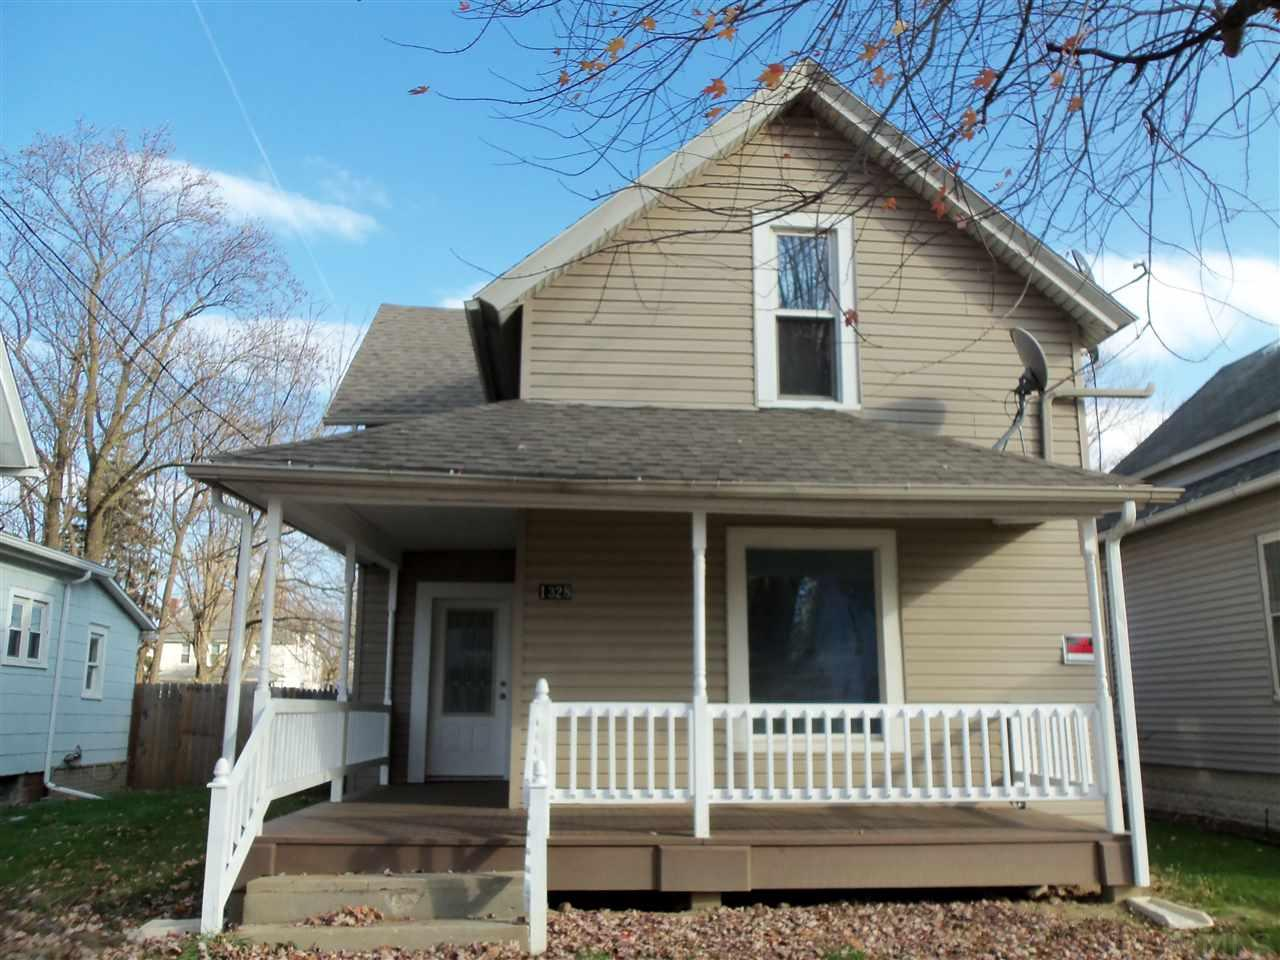 1328 S Jackson St., Auburn, IN 46706